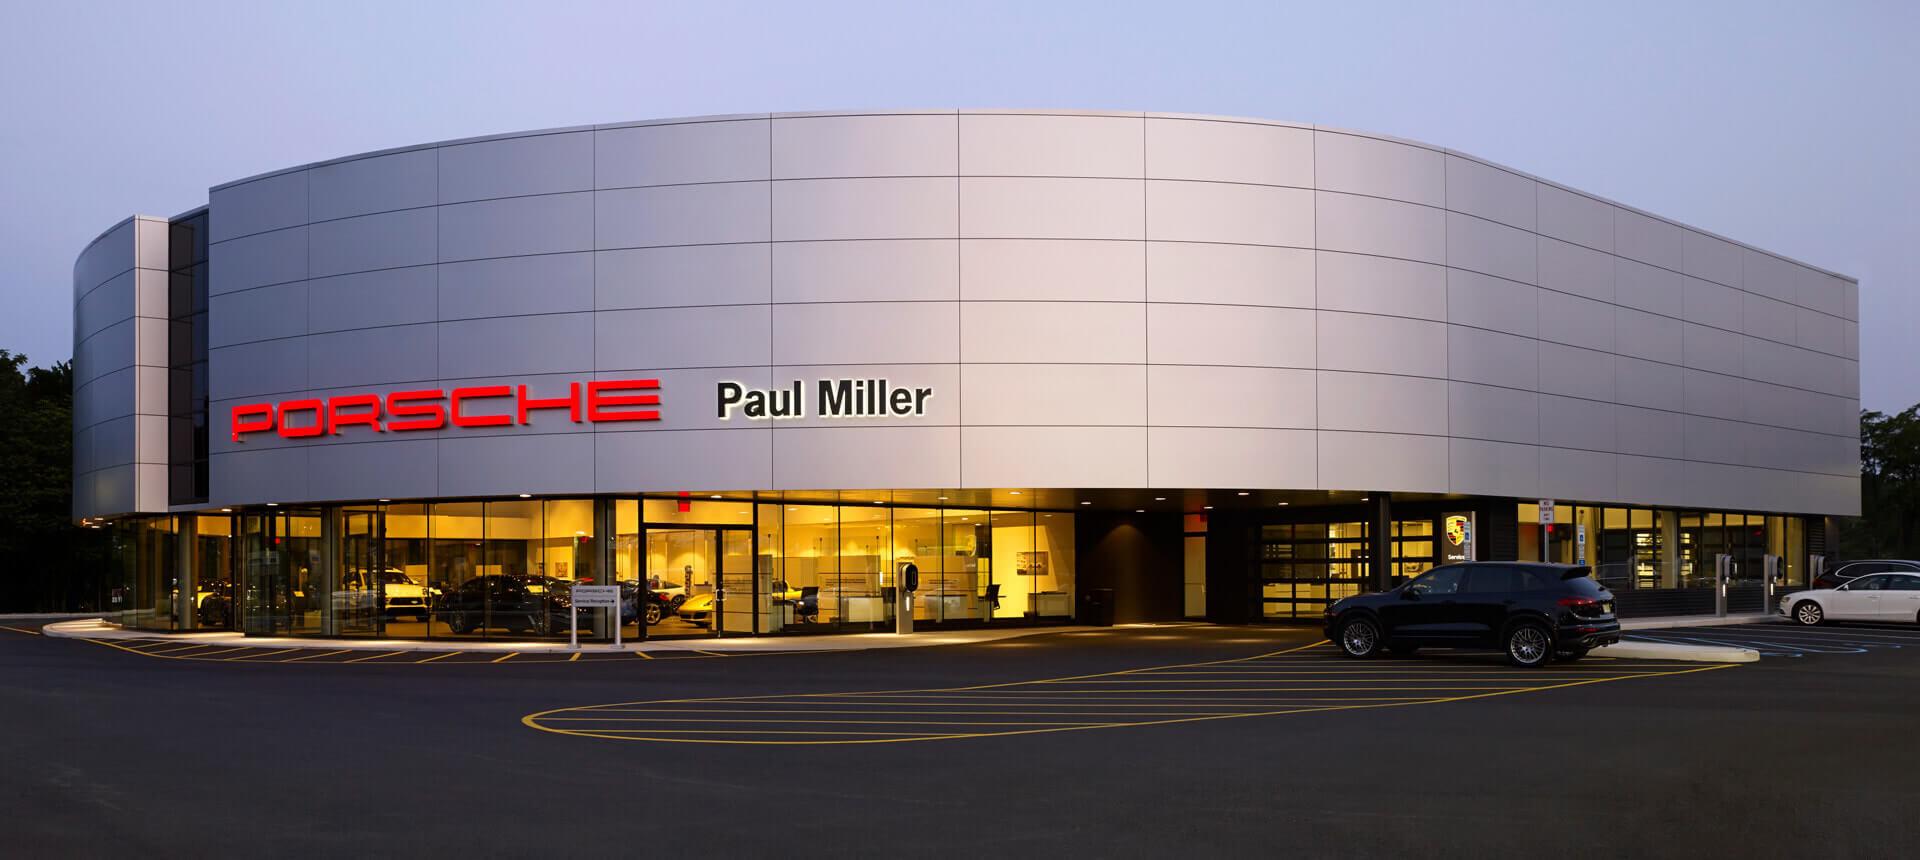 Paul Miller Porsche Callisonrtkl